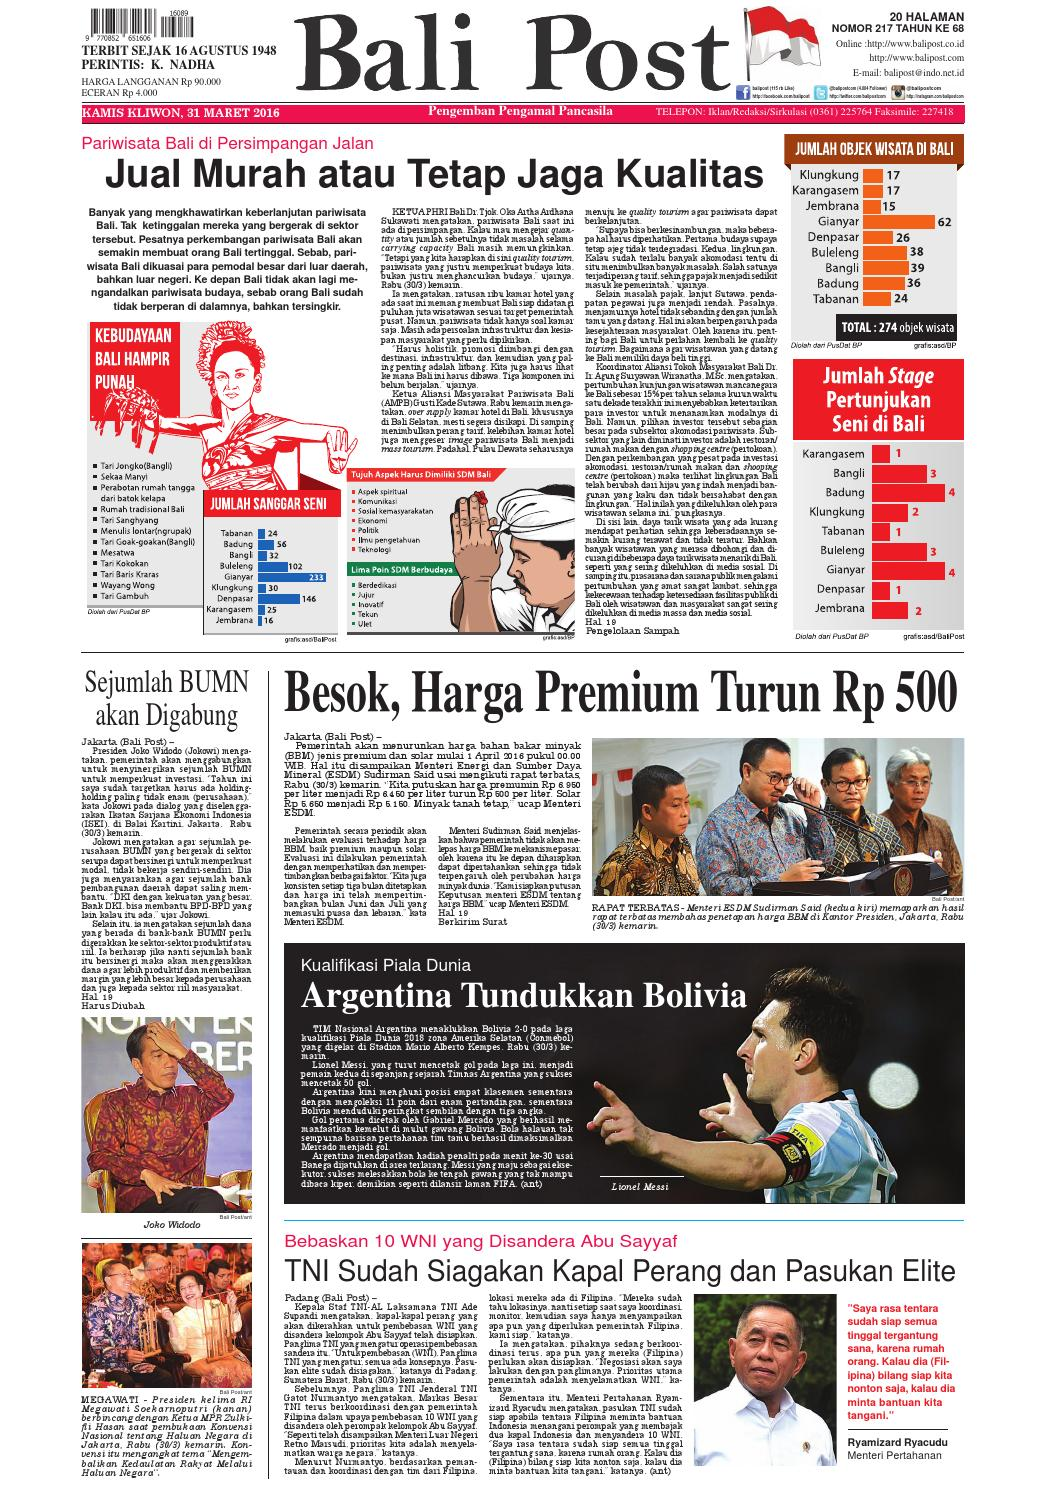 Edisi 31 Maret 2016 Balipostcom By E Paper Kmb Issuu Krezi Kamis 25  Karpet Pp Rug 100x150 Ter Free Ongkir